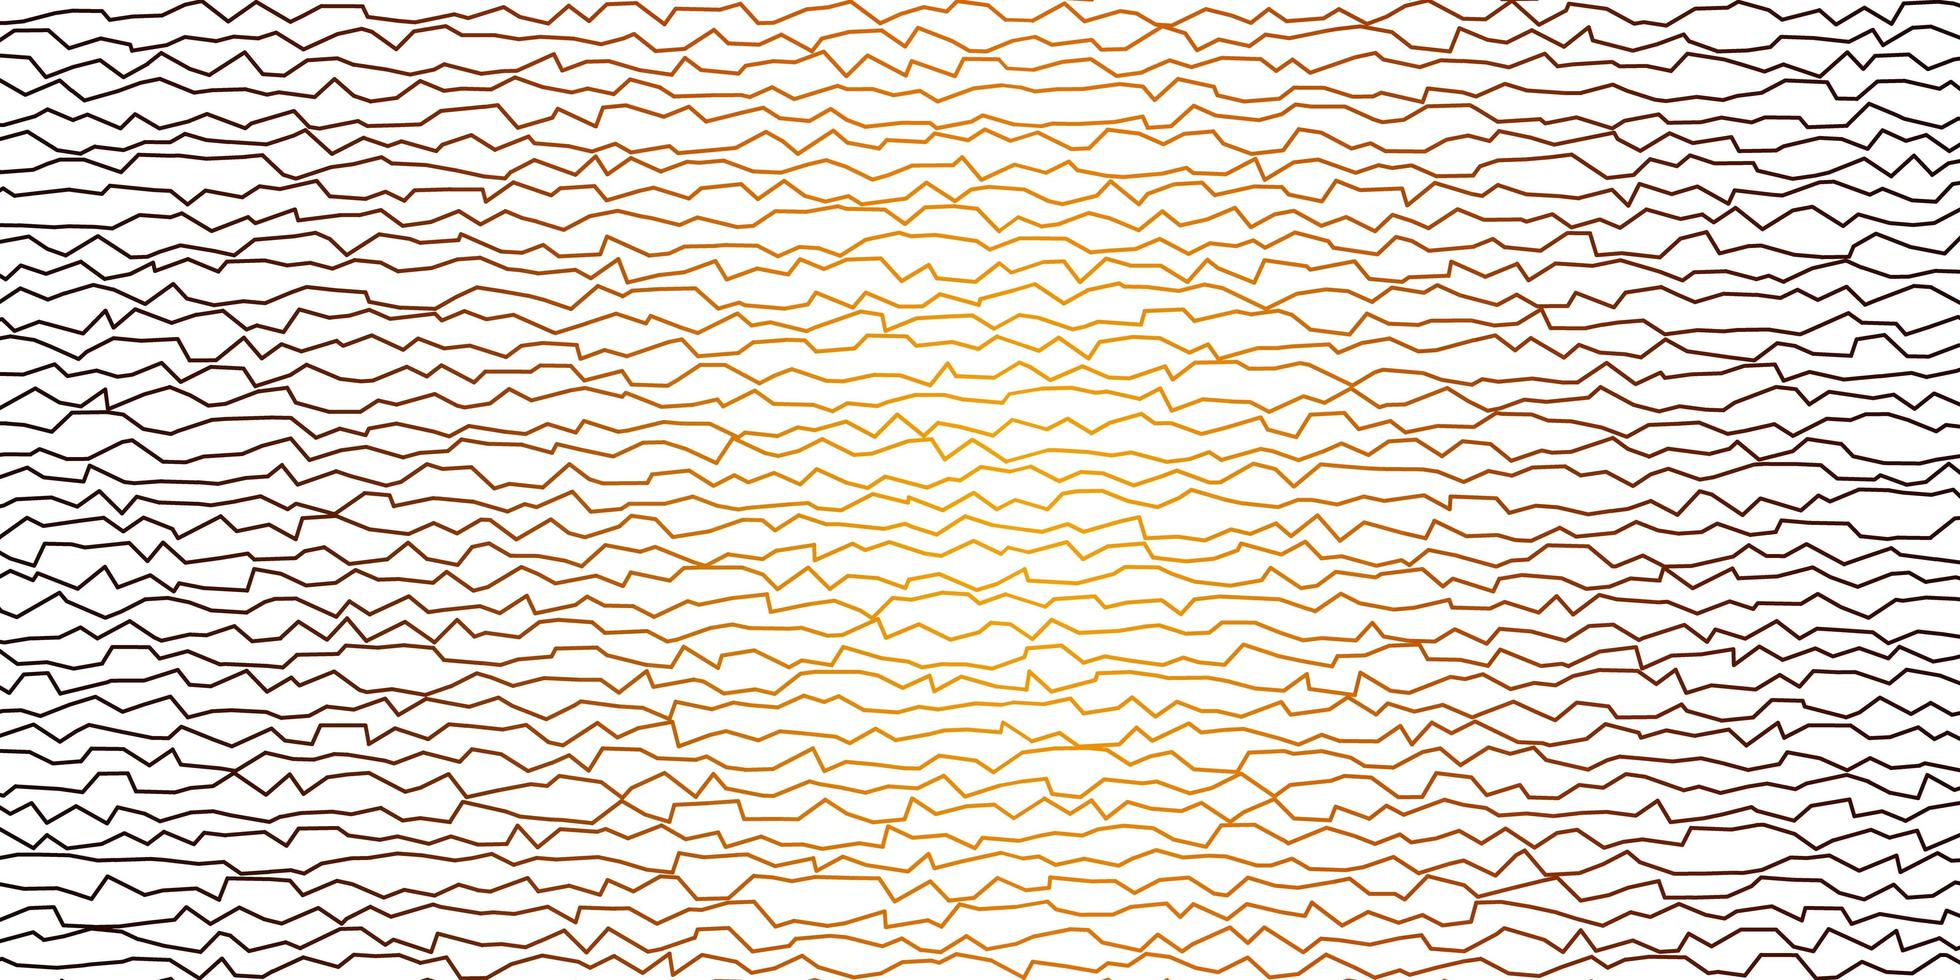 patrón de vector naranja oscuro con líneas curvas.